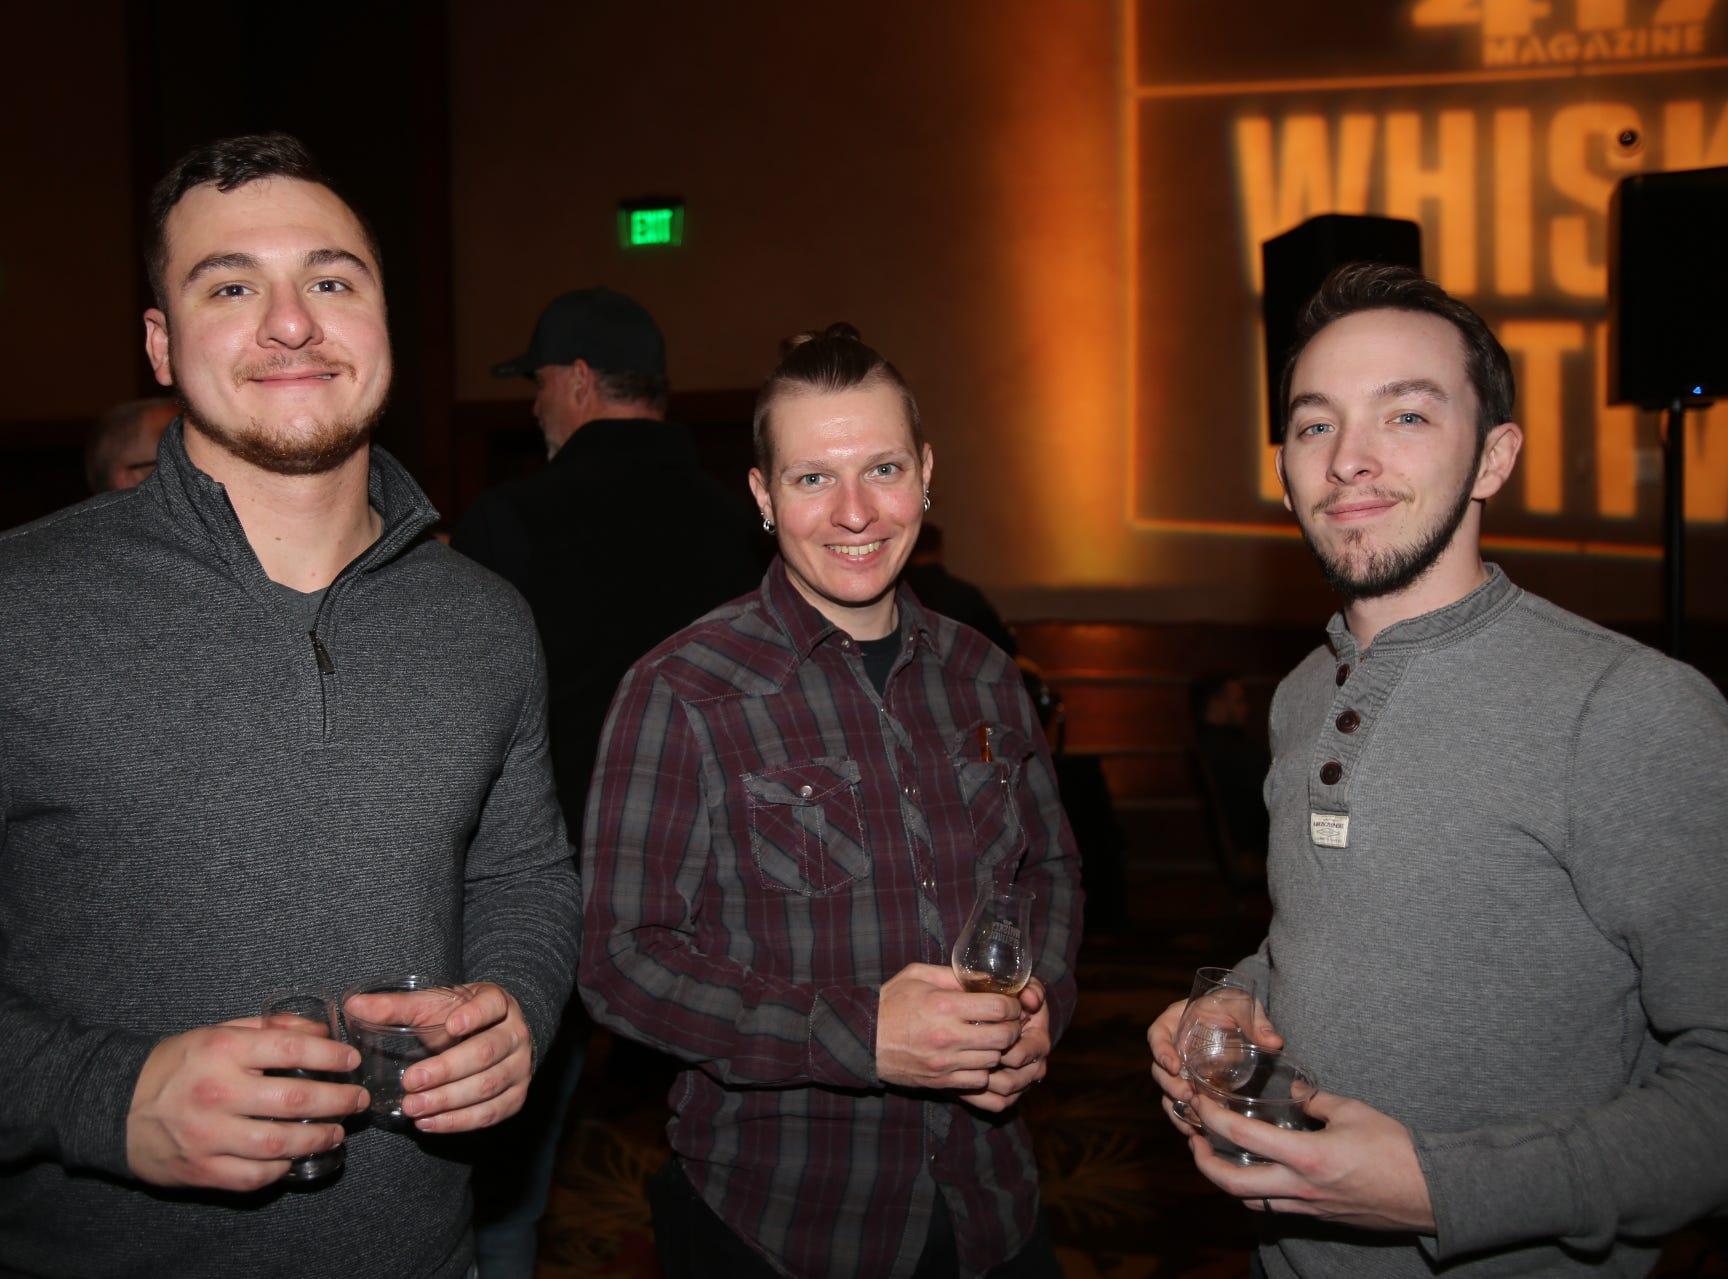 Joel Melchior, Michael Ruch, and Josh Yantis